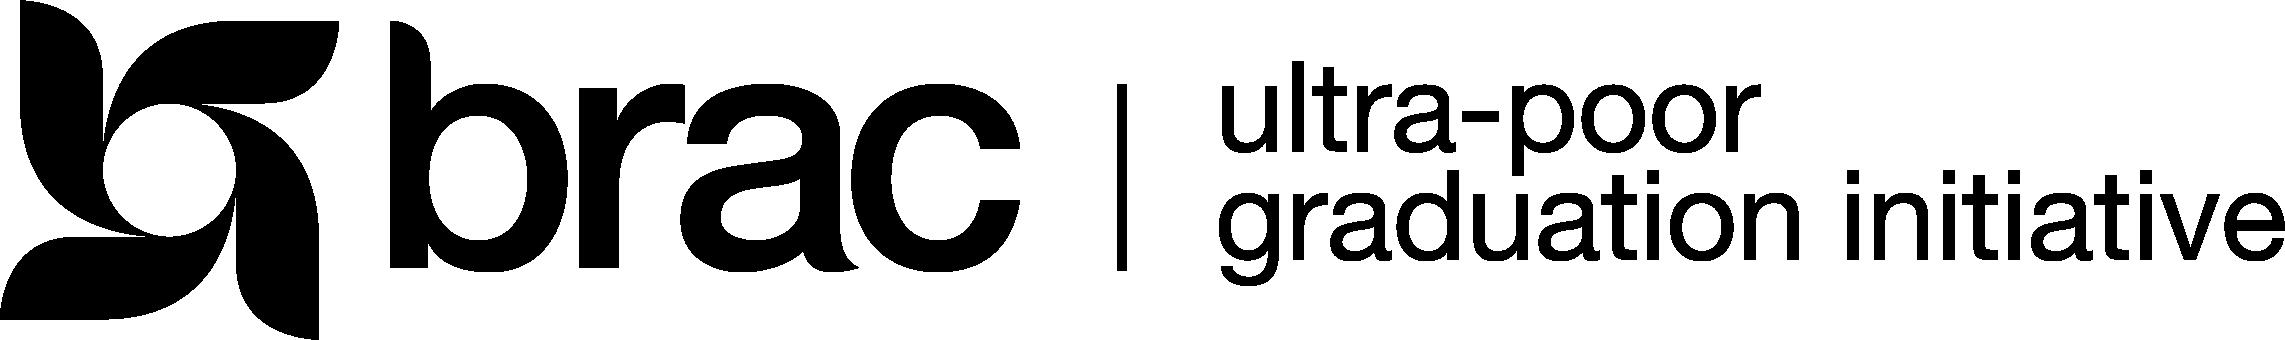 BRAC Ultra Poor Graduation Initiative Logo